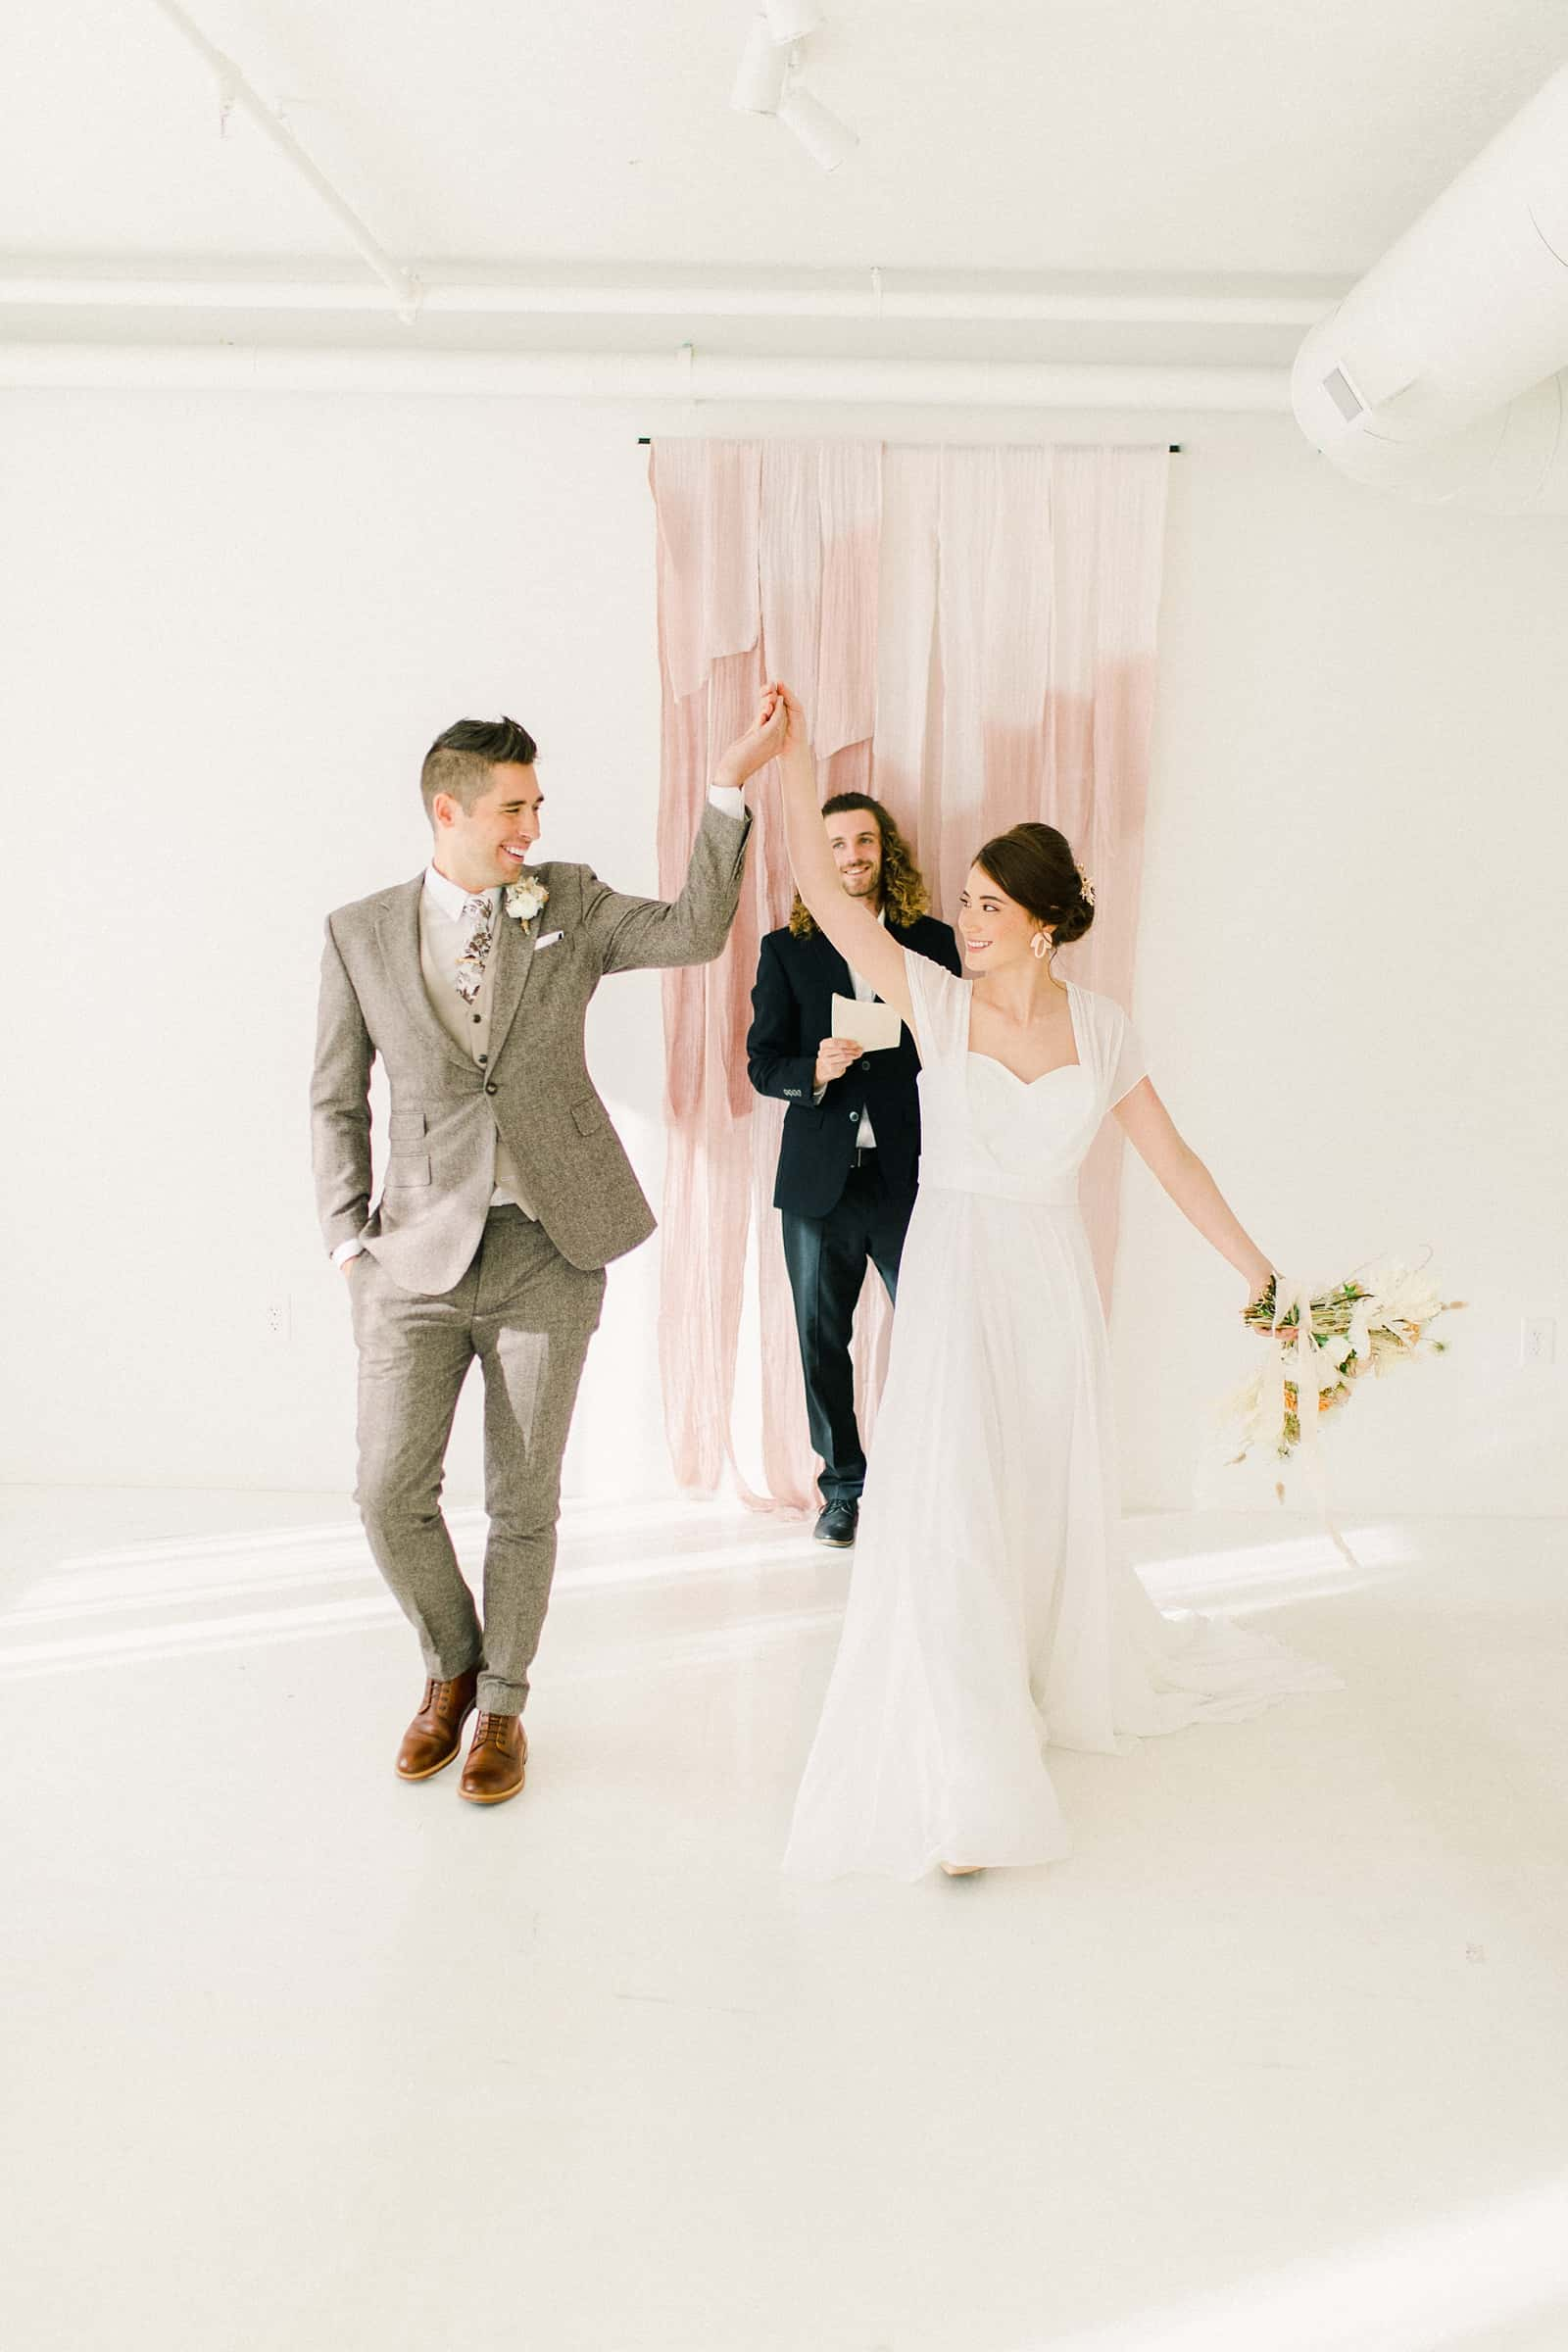 Bride and groom cheer after wedding ceremony